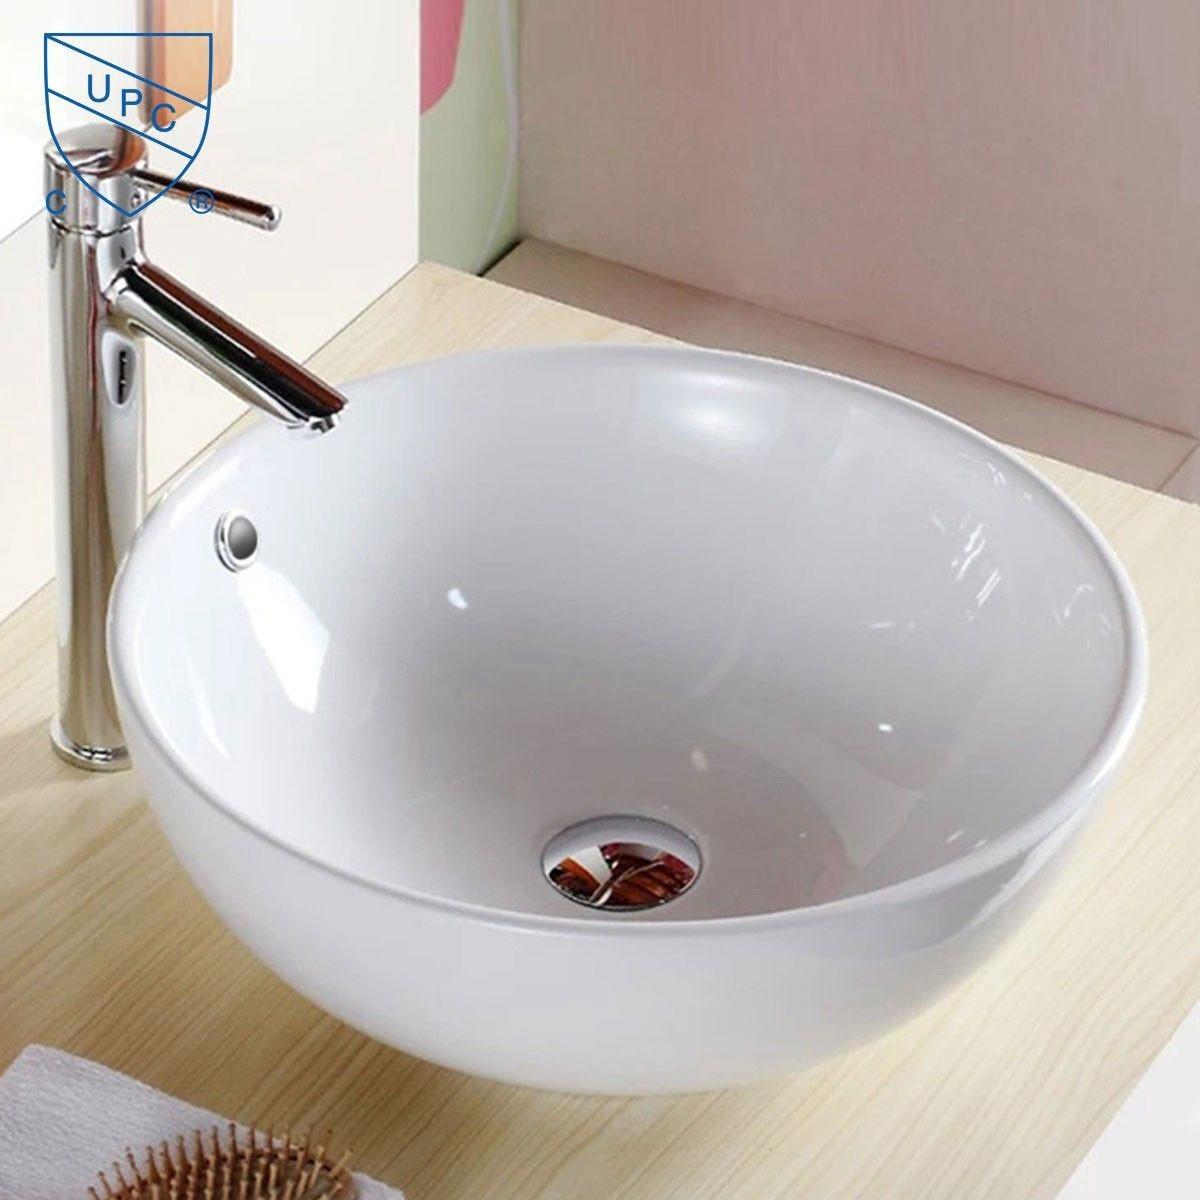 Decoraport White Round Ceramic Above Counter Vessel Sink (CL-1027)